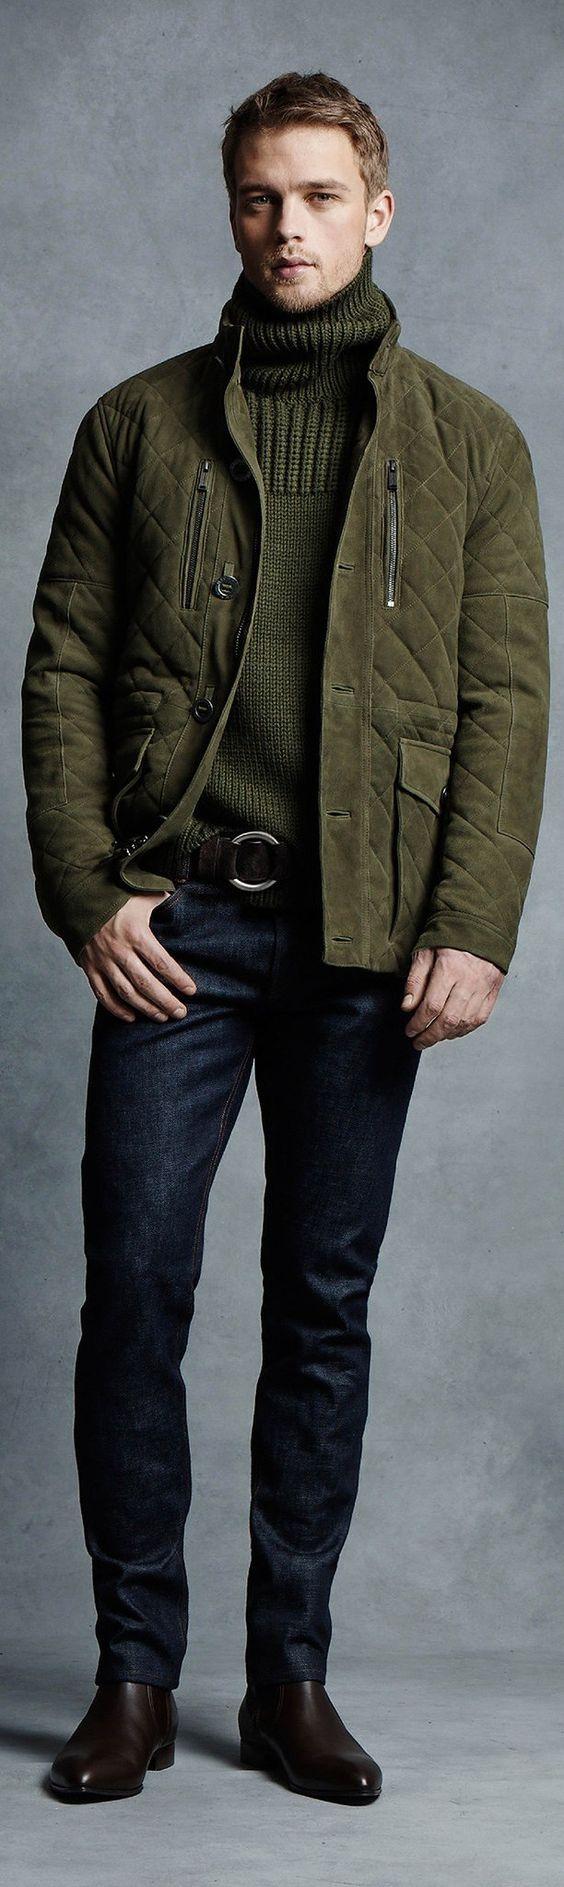 Best 20+ Mens Winter Jackets ideas on Pinterest